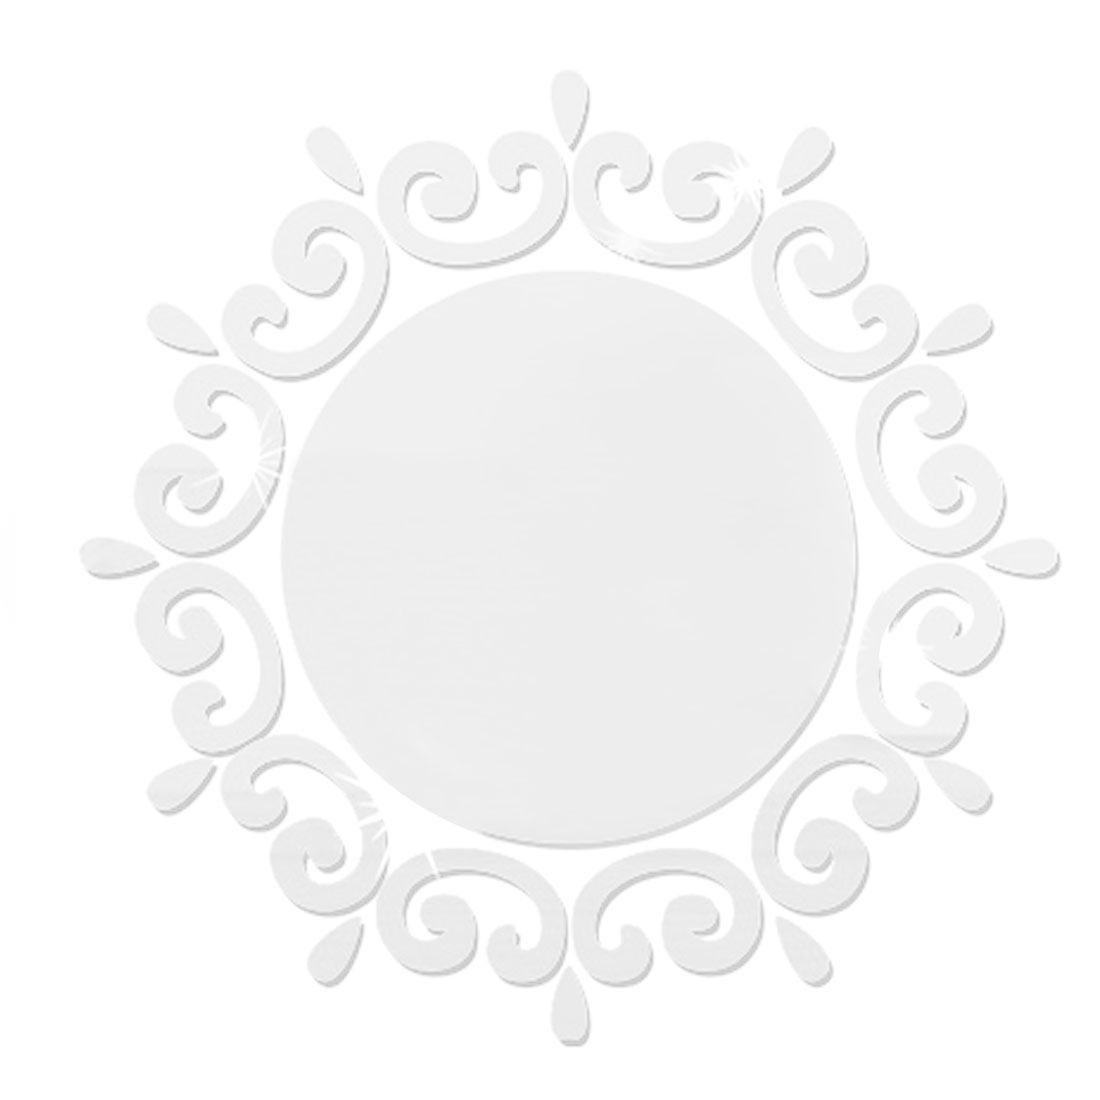 Room Acrylic 3D Art Mural Decor Mirror Wall Sticker Decal Silver Tone